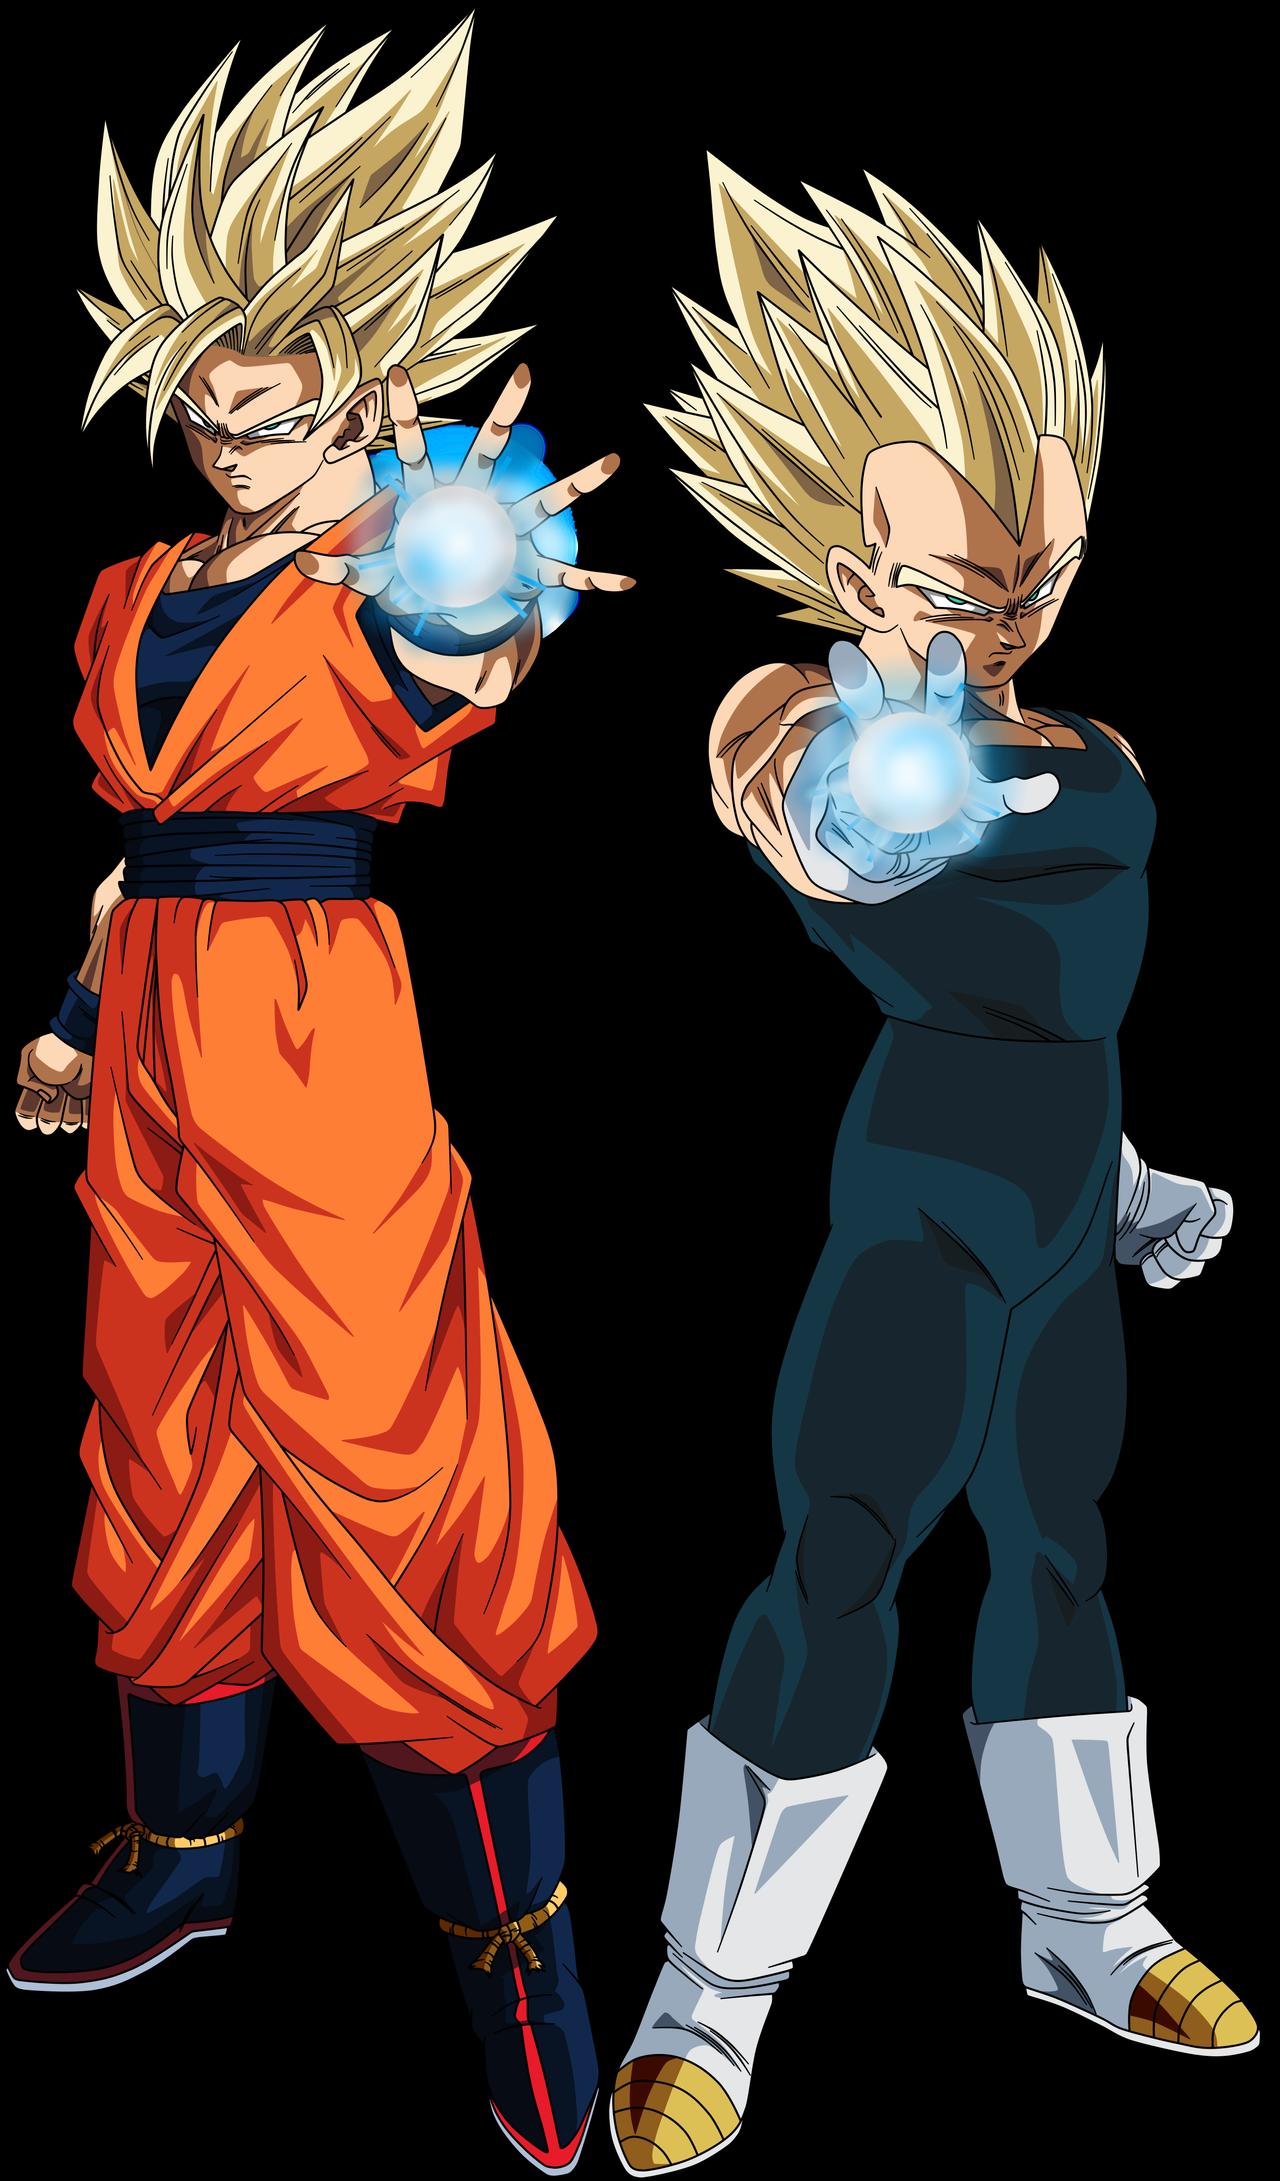 Goku Super Saiyan 2 And Vegeta Super Saiyan 2 By Crismarshall On Deviantart Dragon Ball Super Manga Dragon Ball Goku Anime Dragon Ball Super